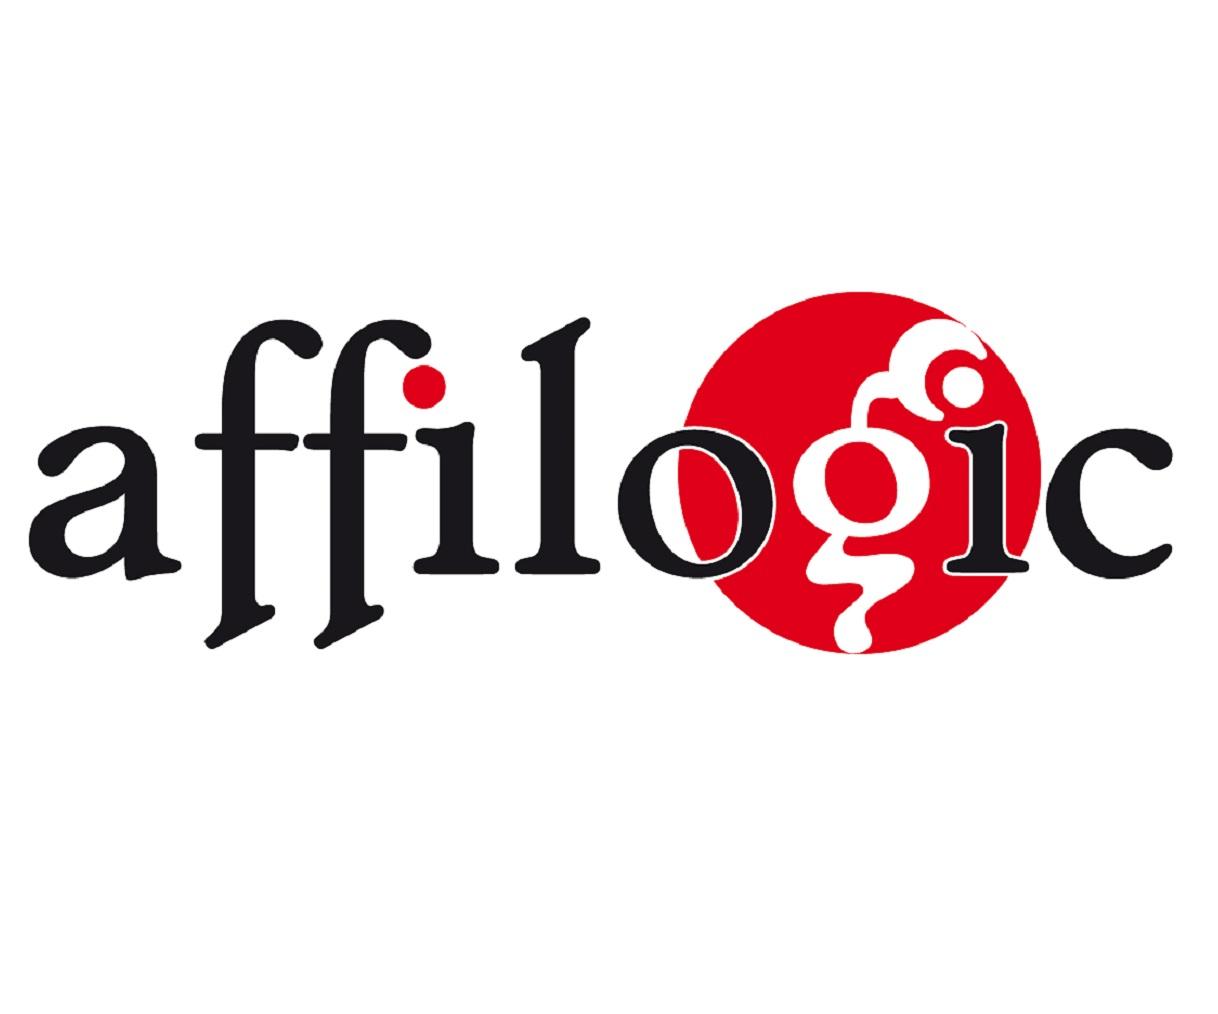 Nouveau logo Affilogic fond blanc - Atlanpole Biotherapies : Atlanpole  Biotherapies